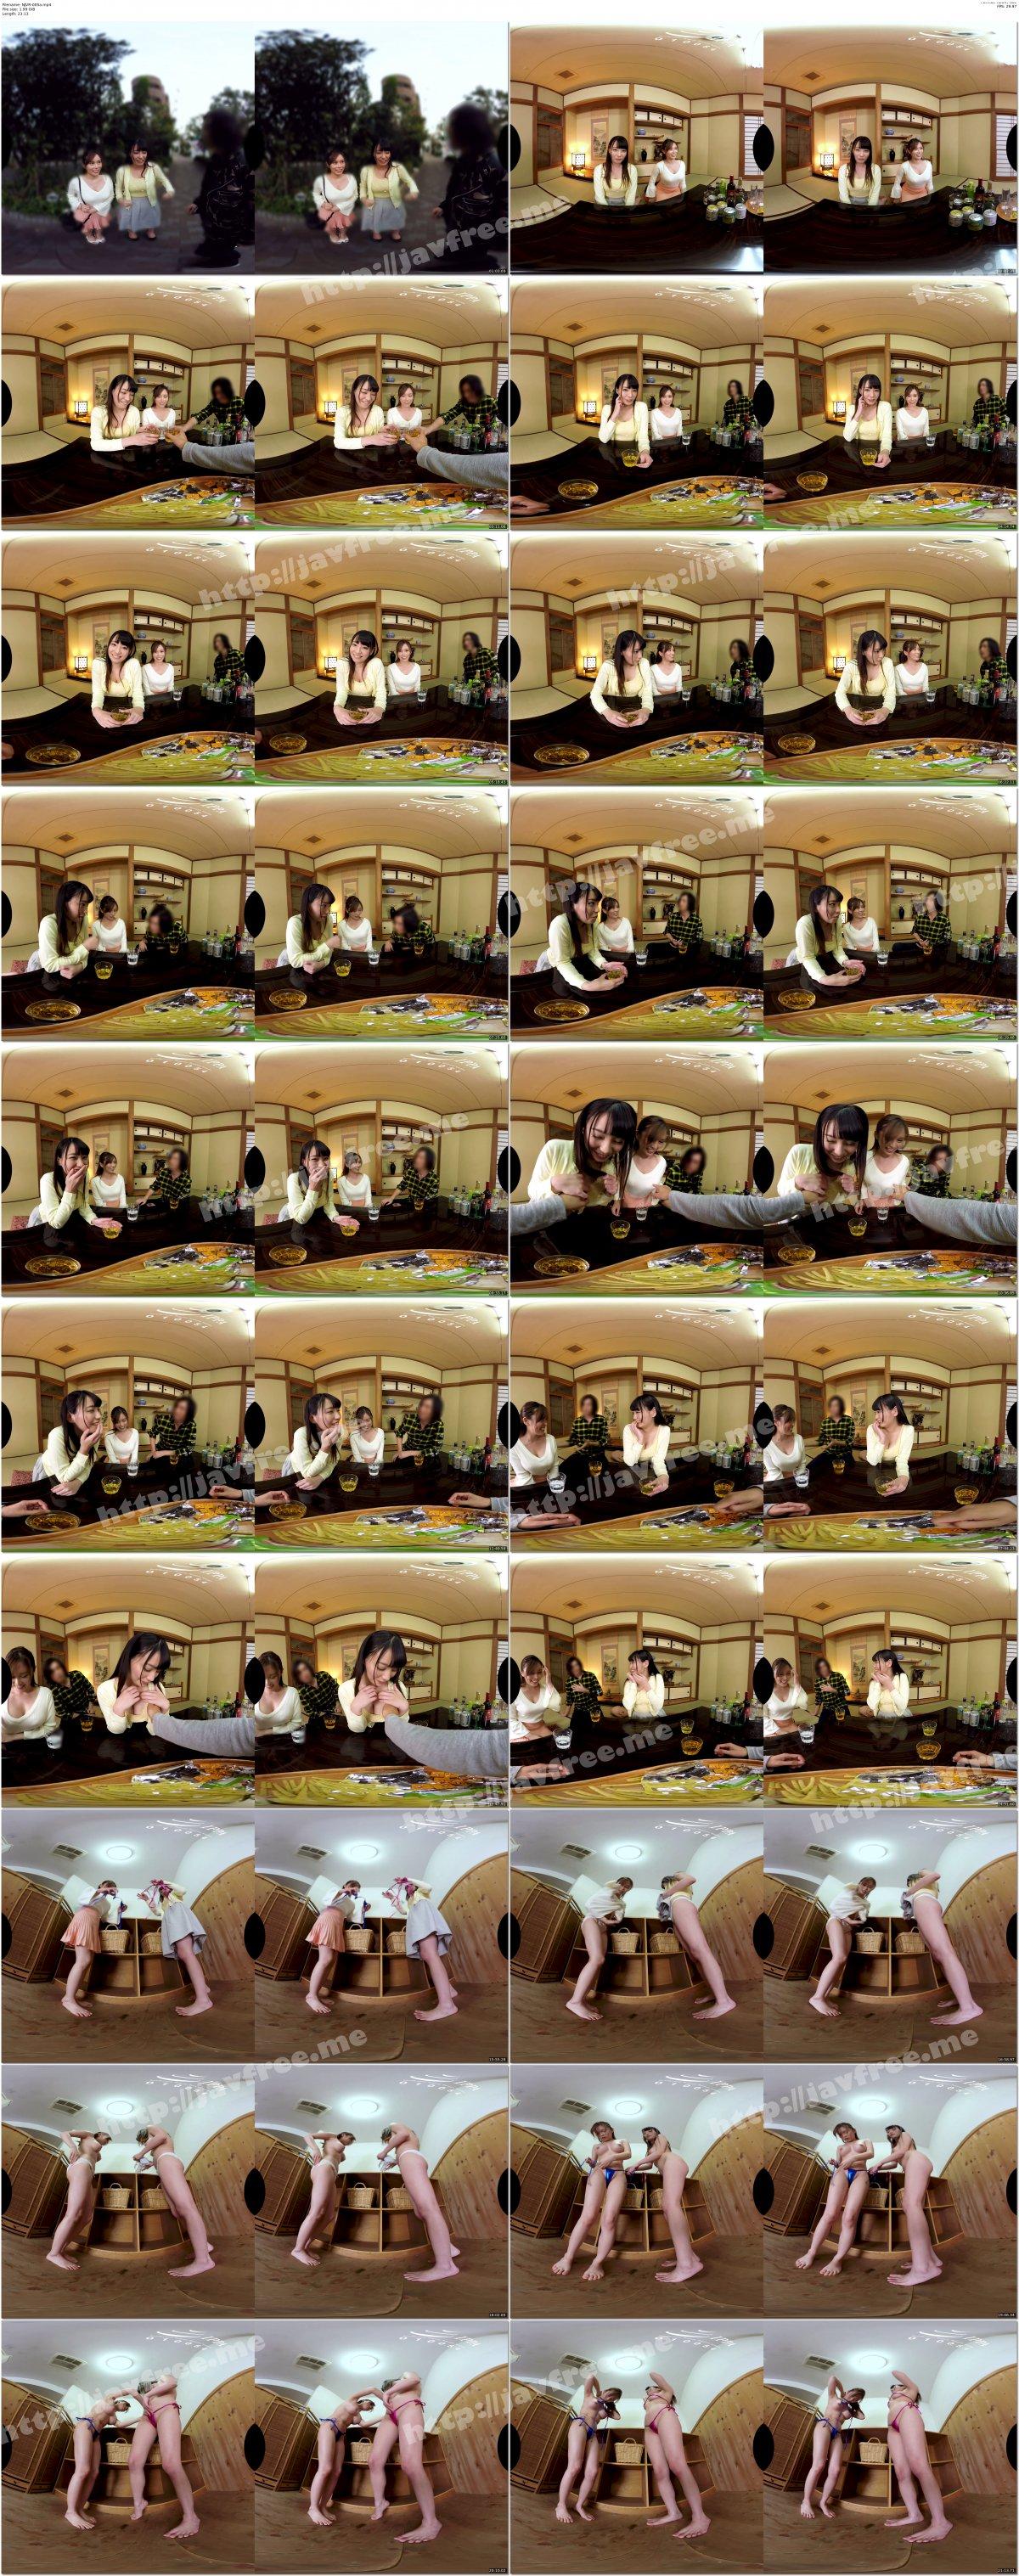 [NJVR-005] 【VR】【ナンパ混浴VR】巨乳シロウト2人と温泉乱交体験 ほろ酔い巨乳娘たちが極小マイクロビキニに着替えて混浴!そして乱交SEXしちゃいました! - image NJVR-005a on https://javfree.me